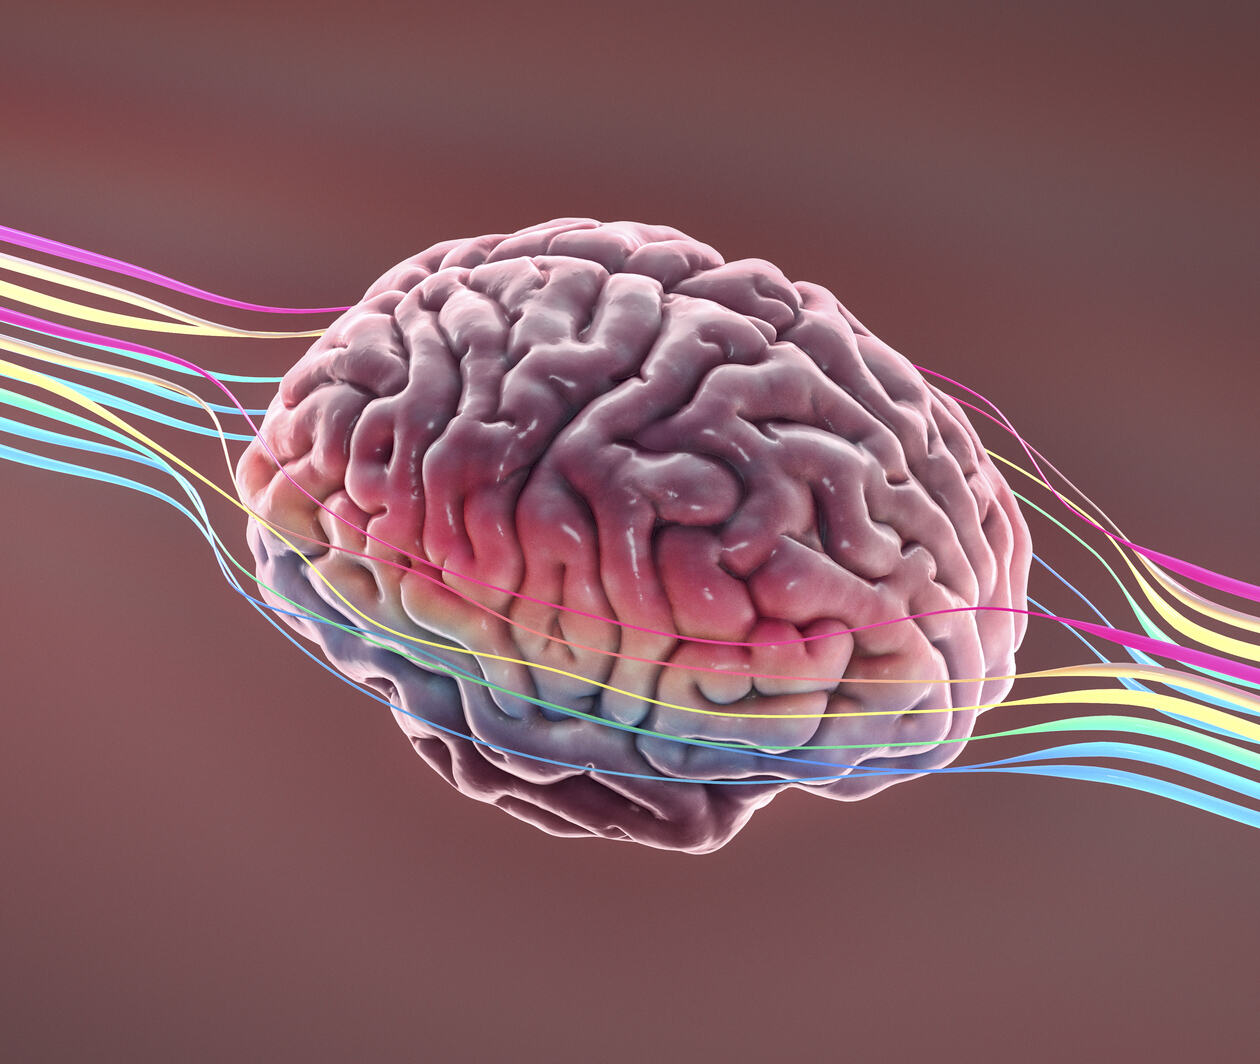 Unlocking The Creative Brain: Develop and Teach Skills For Creative Thinking